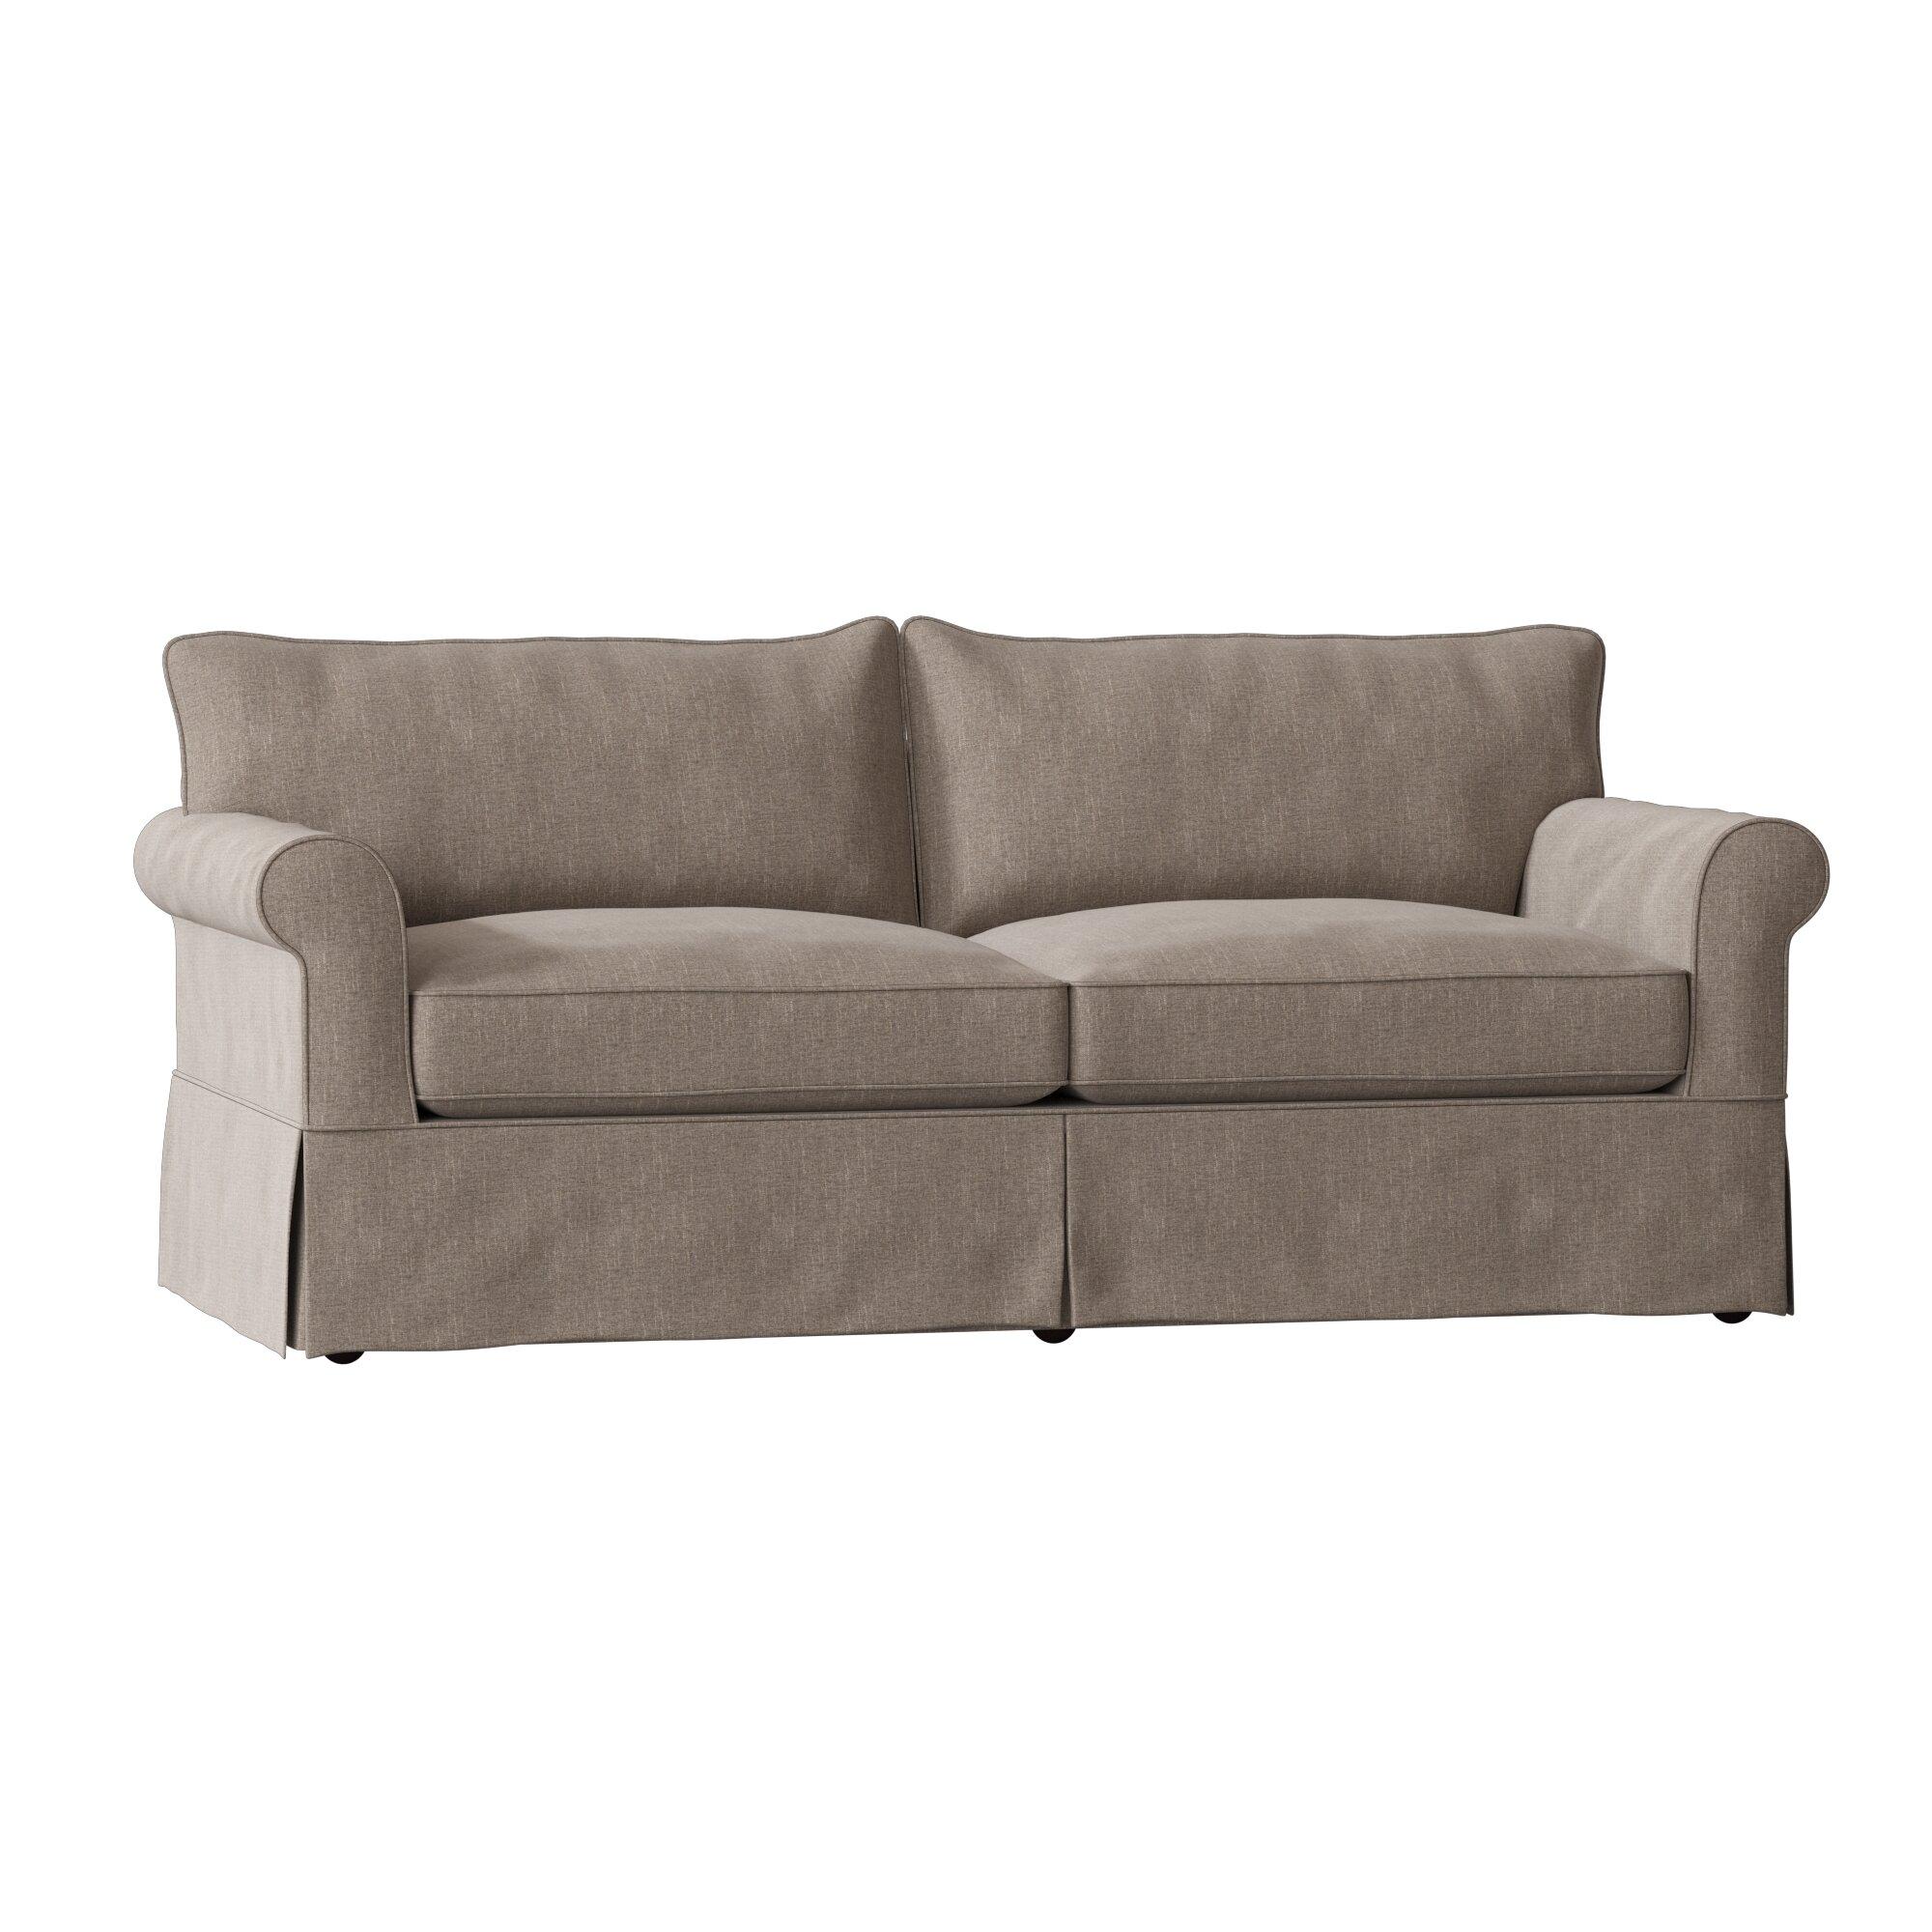 Sensational Donatella Sofa Bed Creativecarmelina Interior Chair Design Creativecarmelinacom